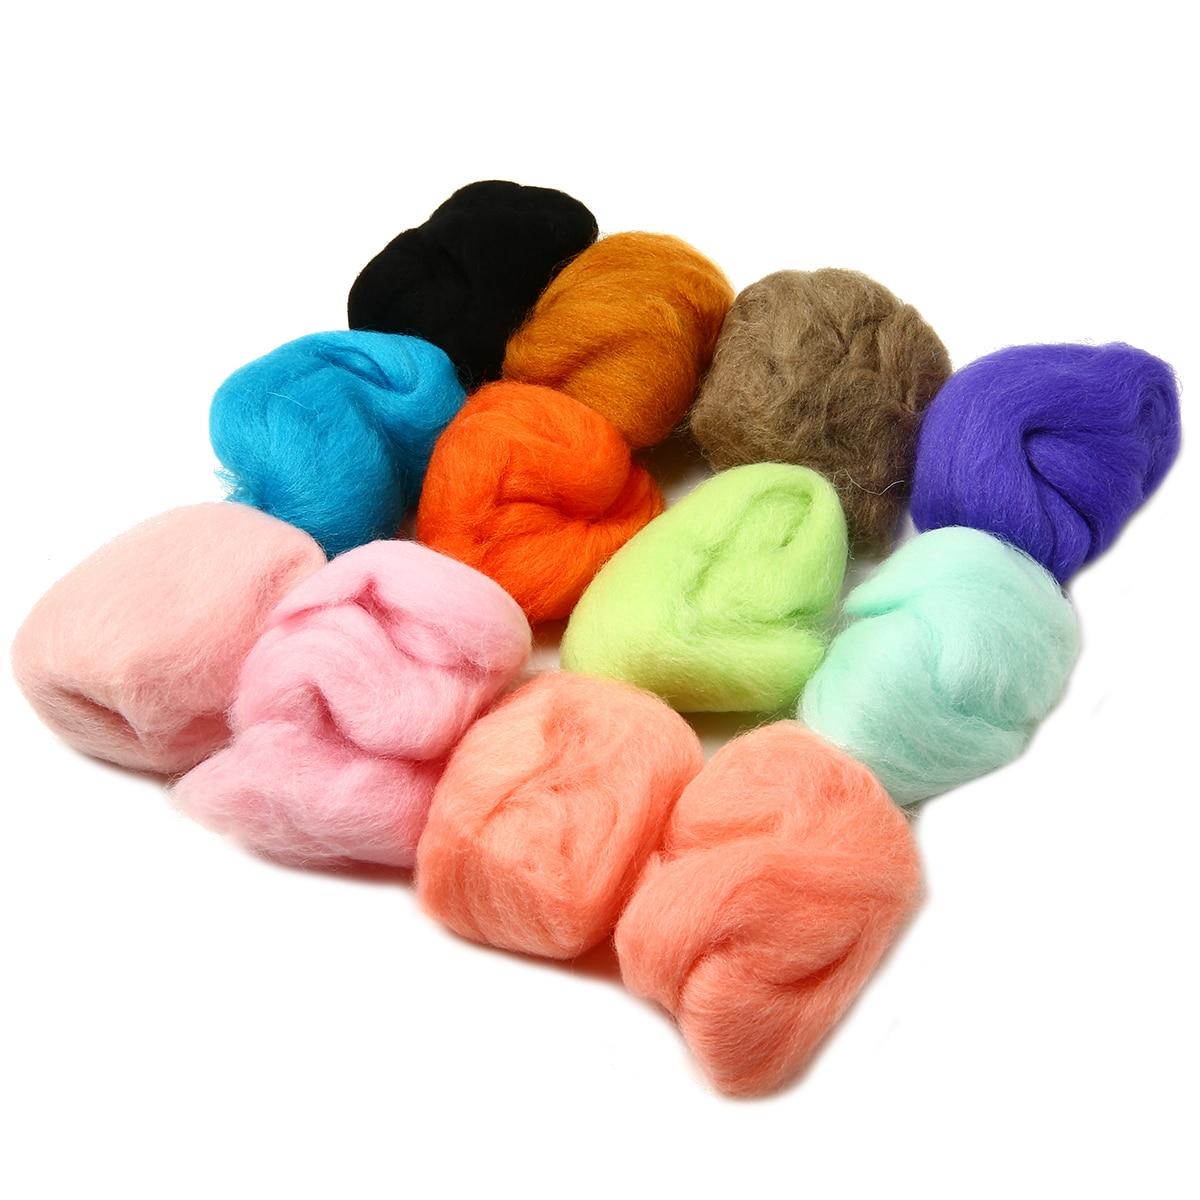 12 Colors 5g/bag Wool Fibre Roving For DIY Needle Felting Hand Spinning DIY Fun Doll Needlework Raw Wool Felt poke